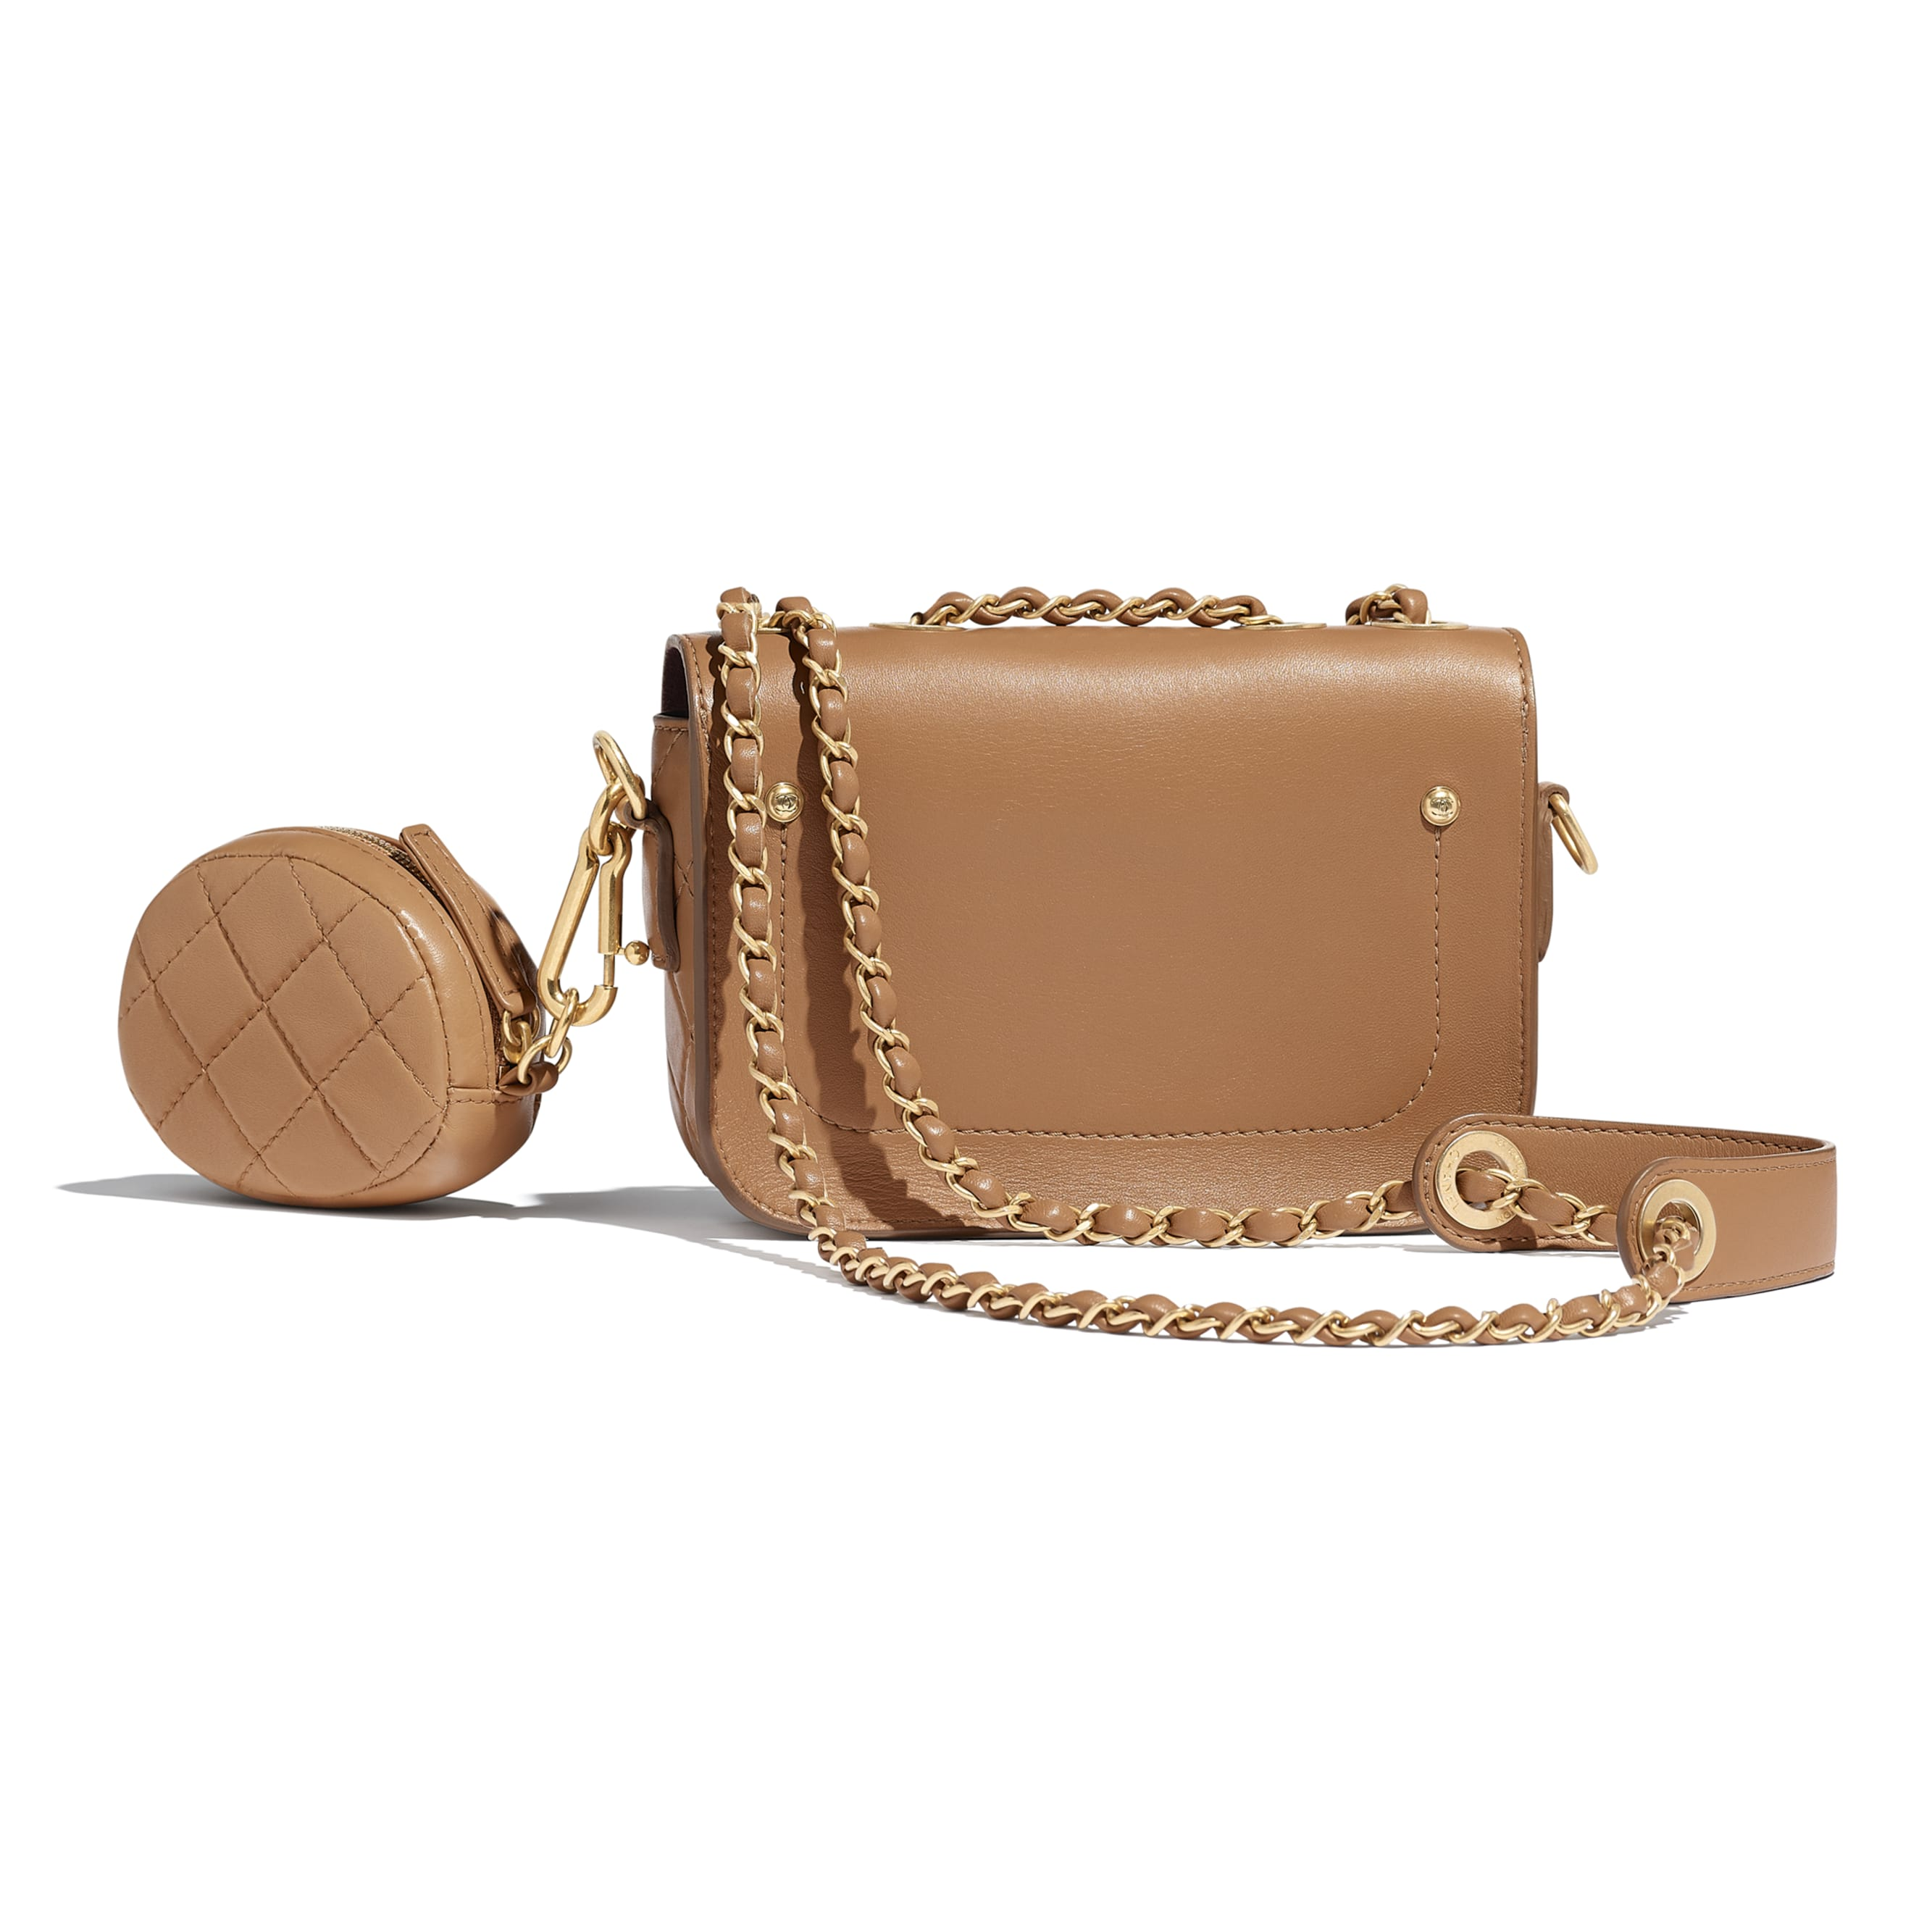 Flap Bag & Coin Purse - Beige - Calfskin & Gold-Tone Metal - Alternative view - see standard sized version